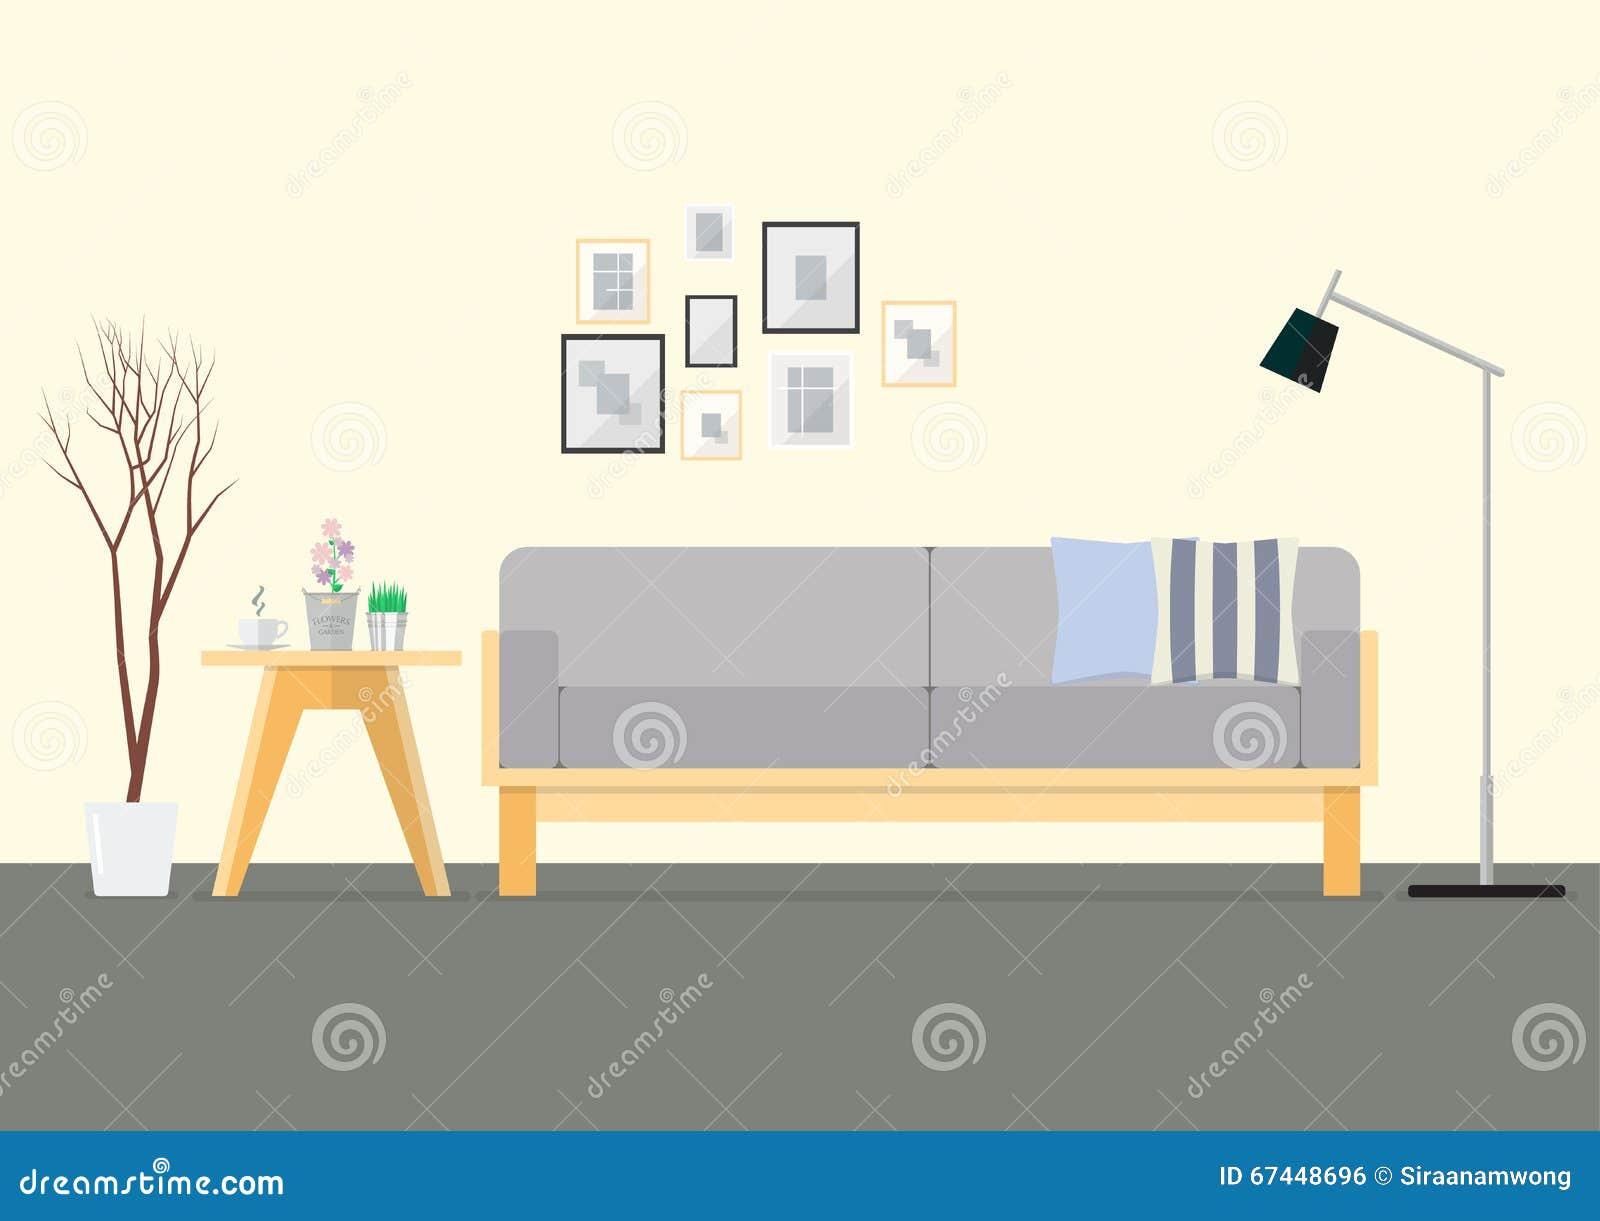 Design Flat Interior Living Room